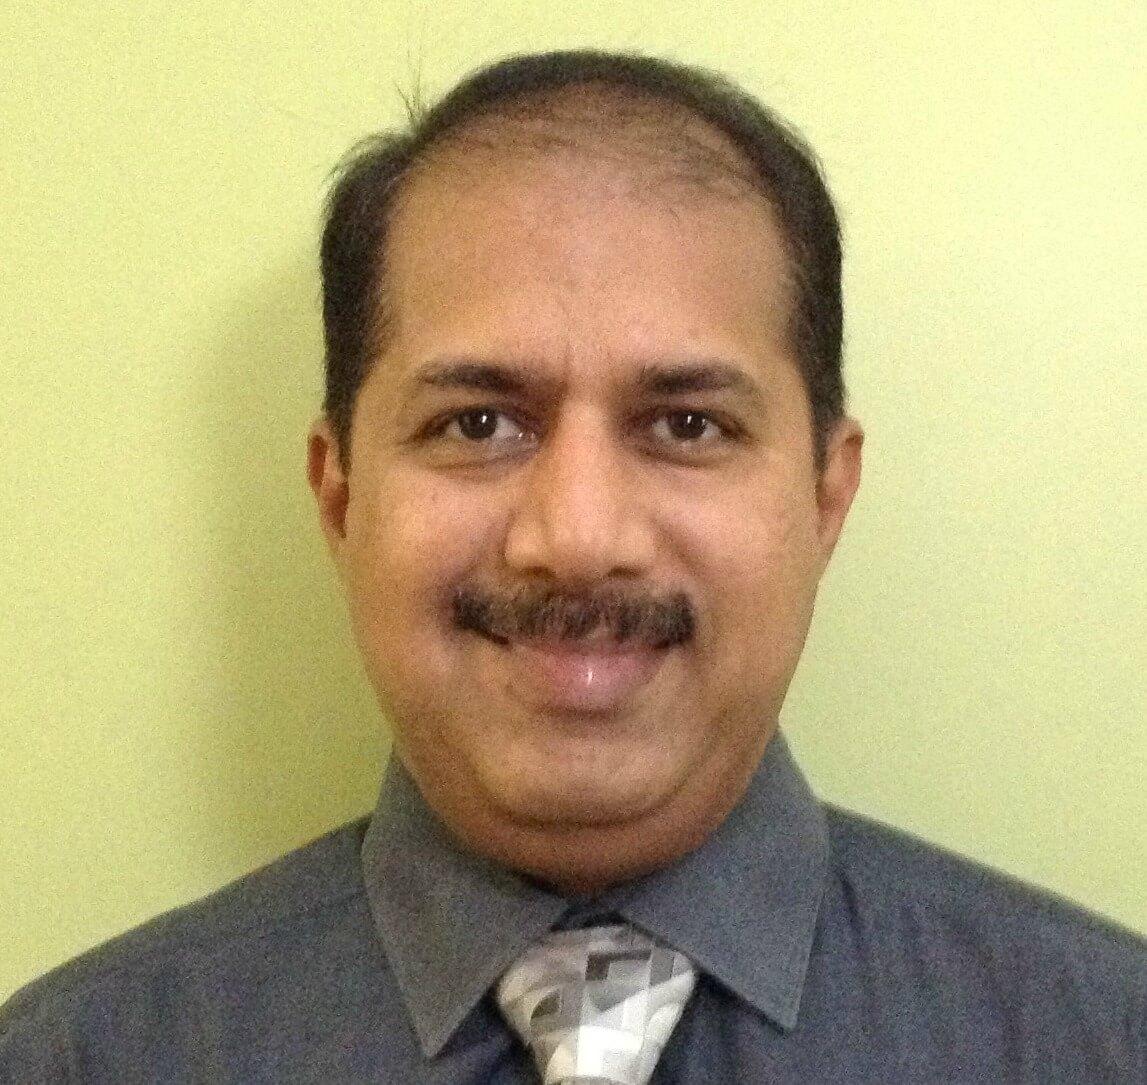 Yashodhan-Ratnakar-1 Yashodhan Ratnakar: Servicers Should Track All Vendors Using A Single System